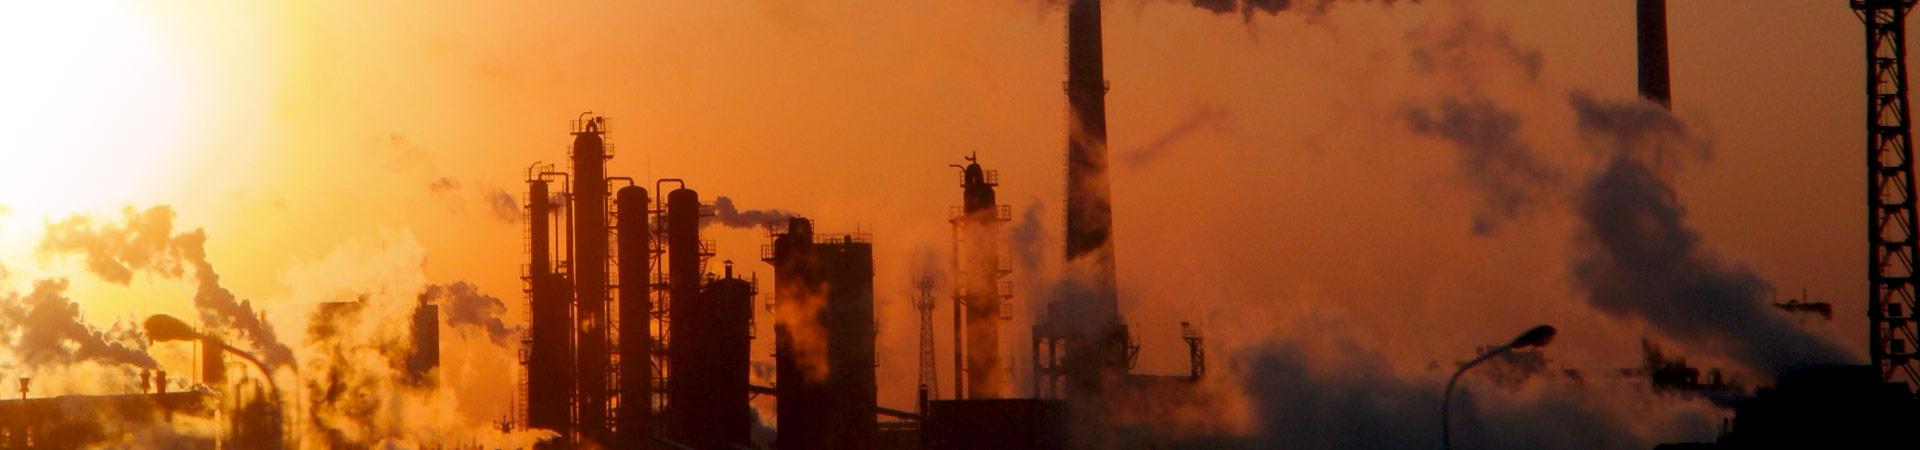 global warming chimneys at sunset